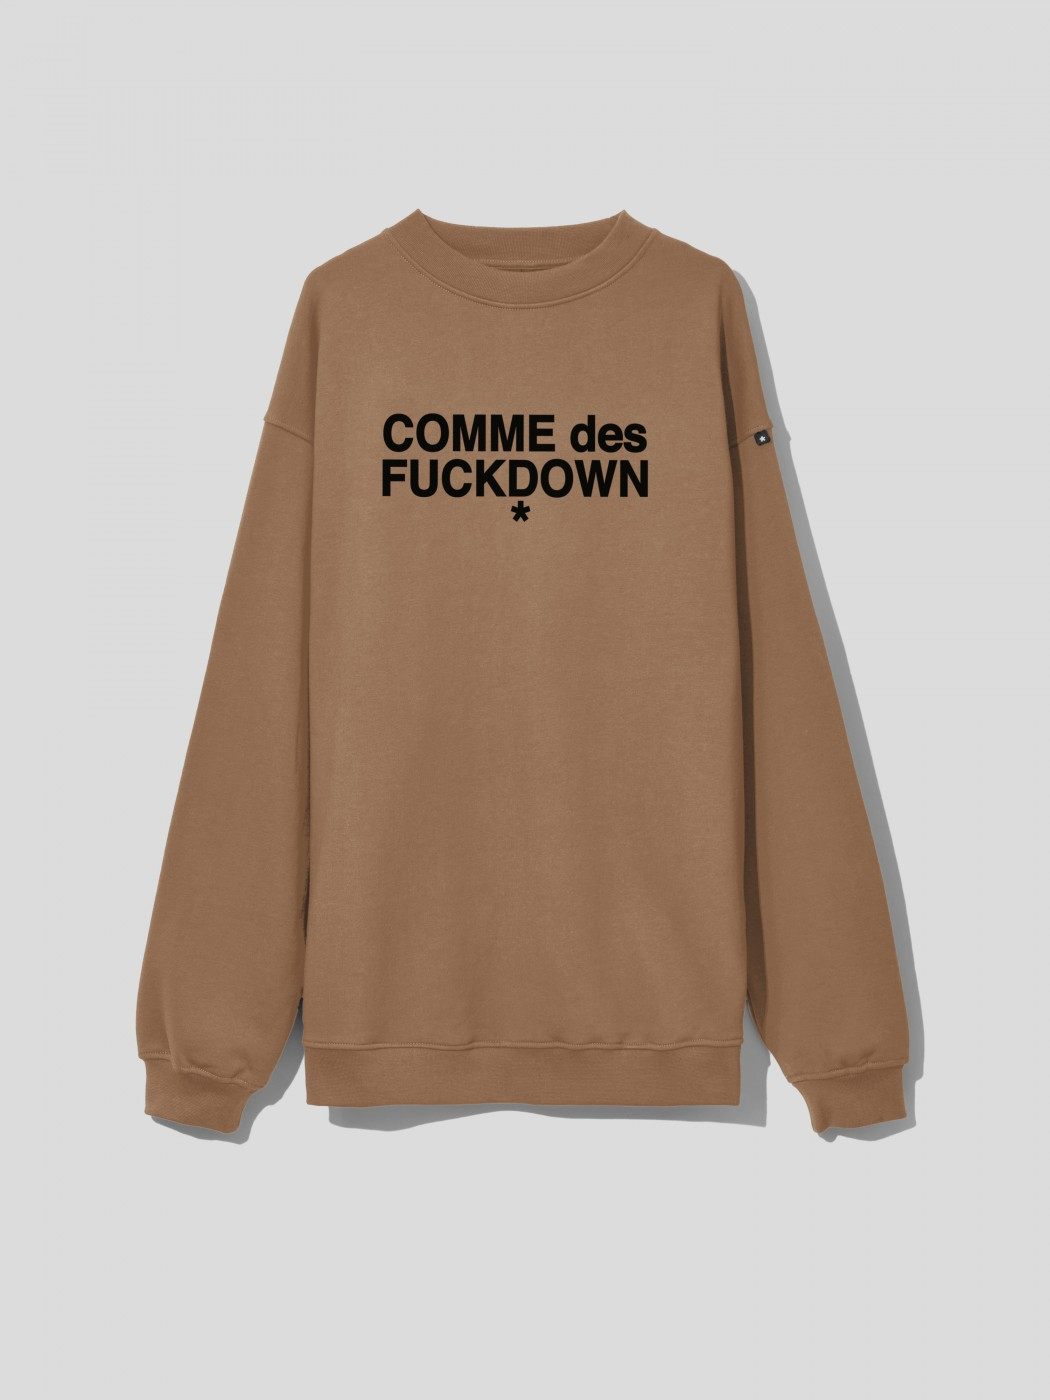 SWEATSHIRT - CDFU1231 - COMME DES FKDOWN